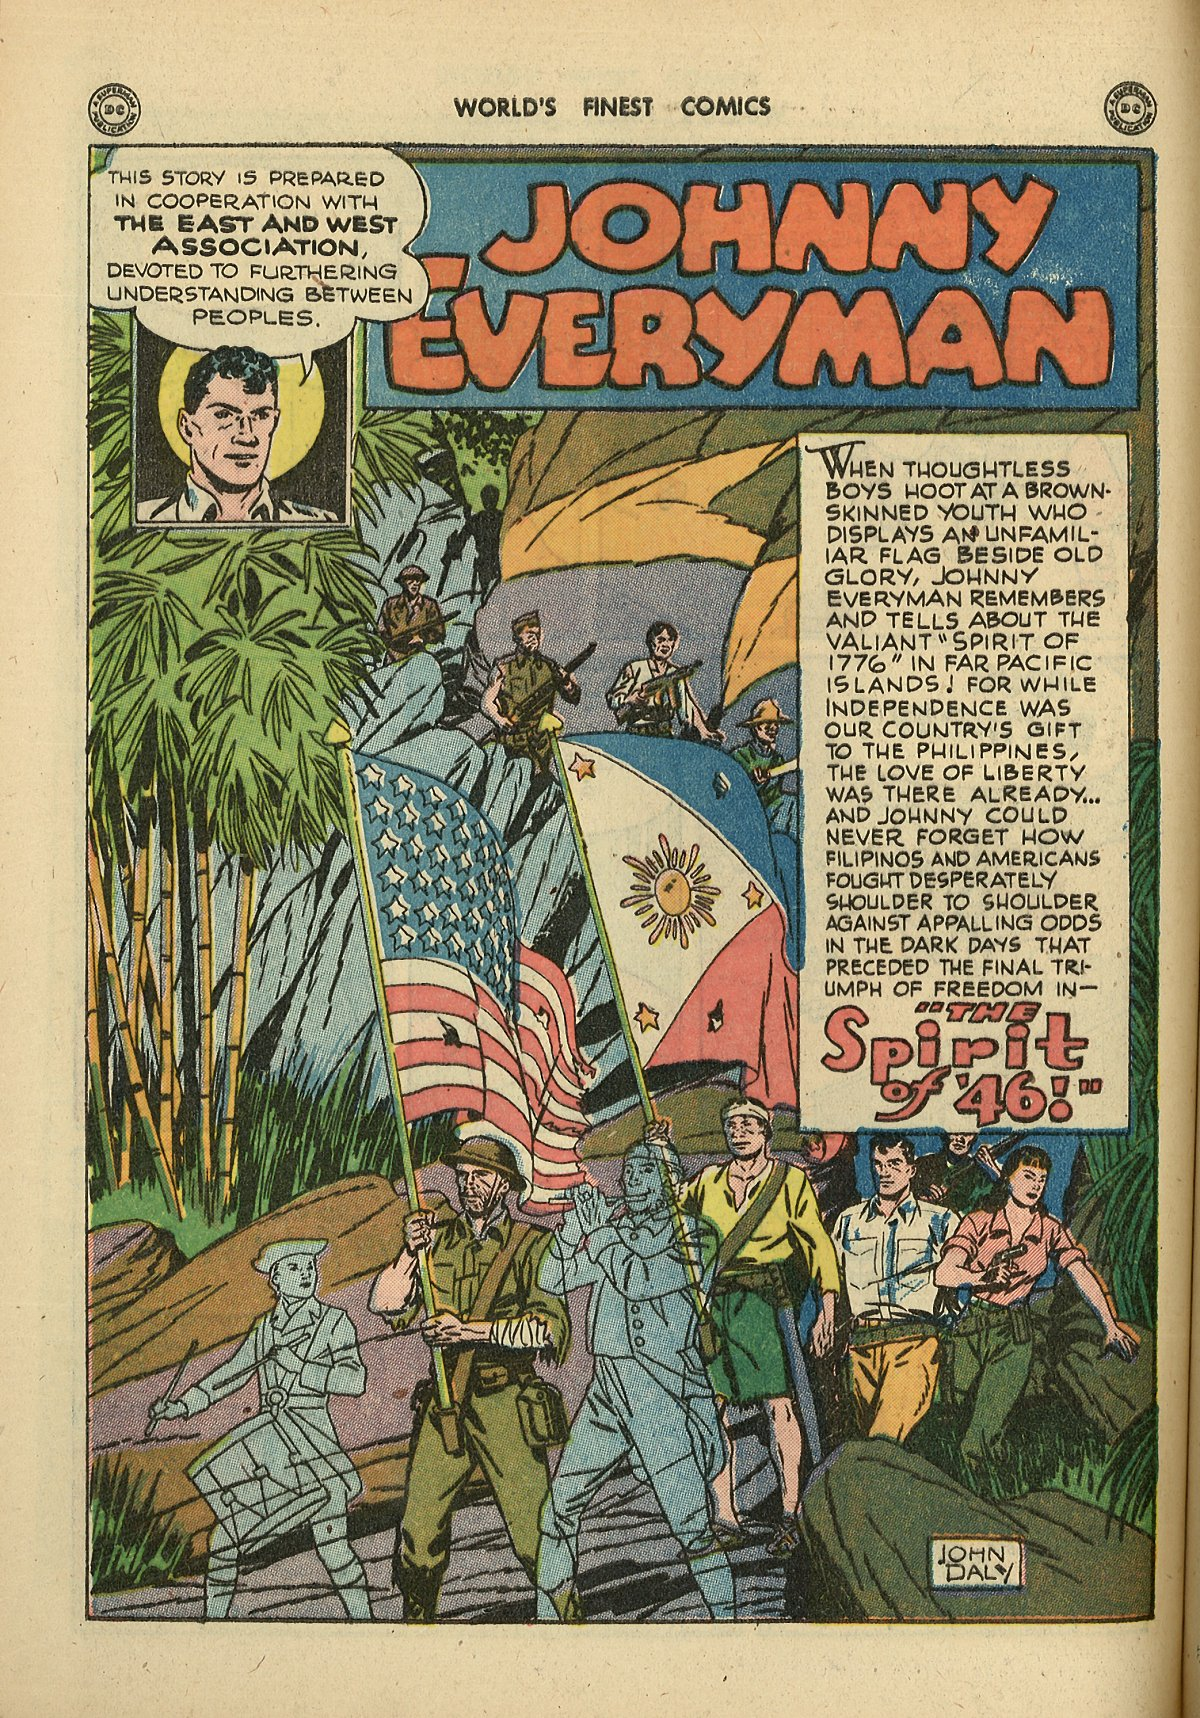 Read online World's Finest Comics comic -  Issue #26 - 40